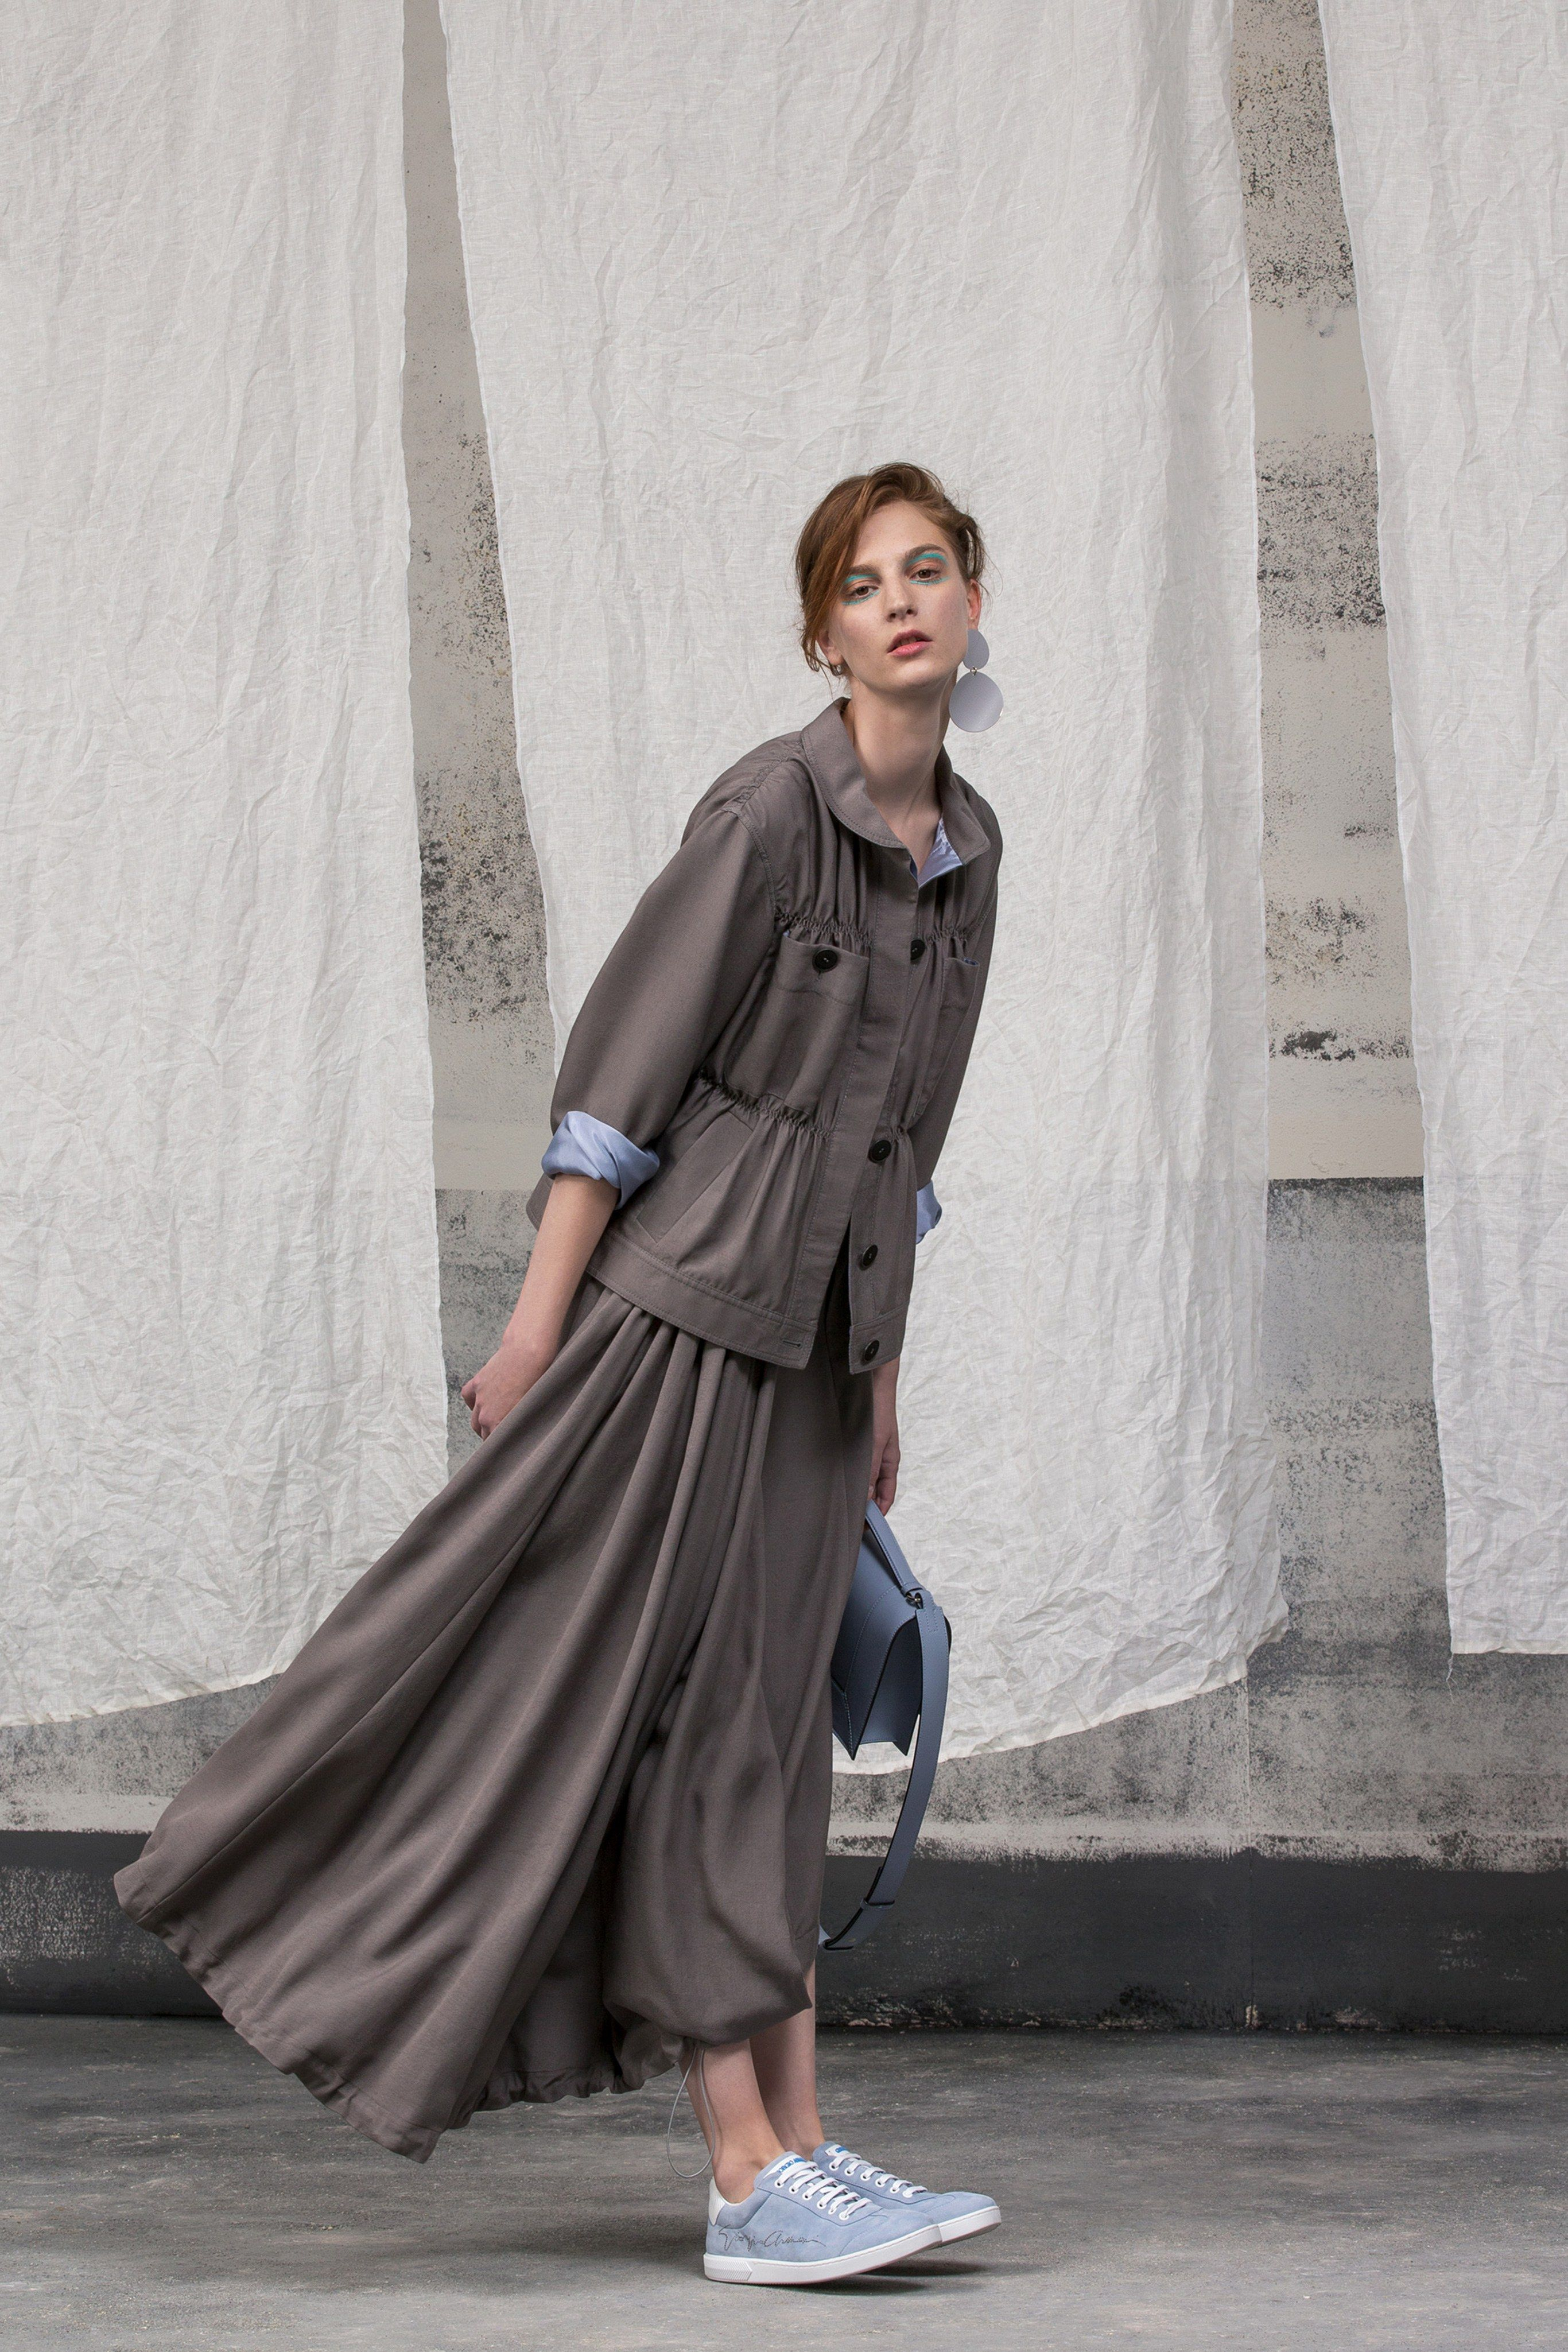 9ead0ecc2805 Giorgio Armani Resort 2019 Fashion Show | Resort 2019 Fashion ...